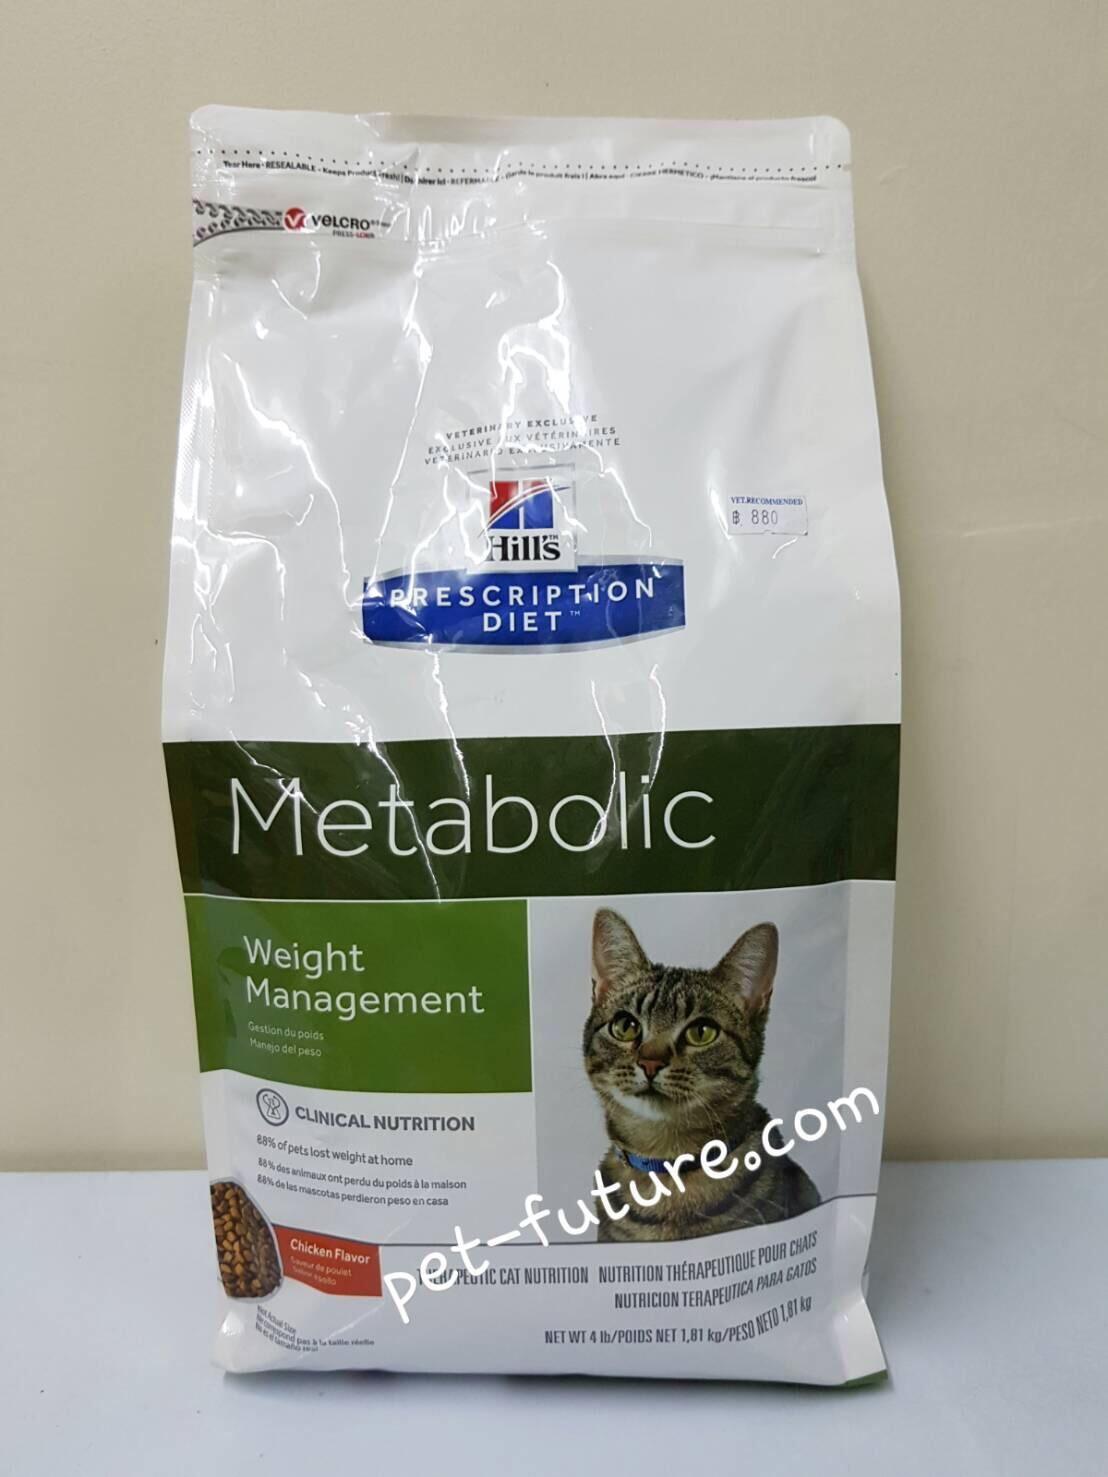 Metabolic feline 1.5 kg. exp.10/18 แบบใหม่ค่ะ